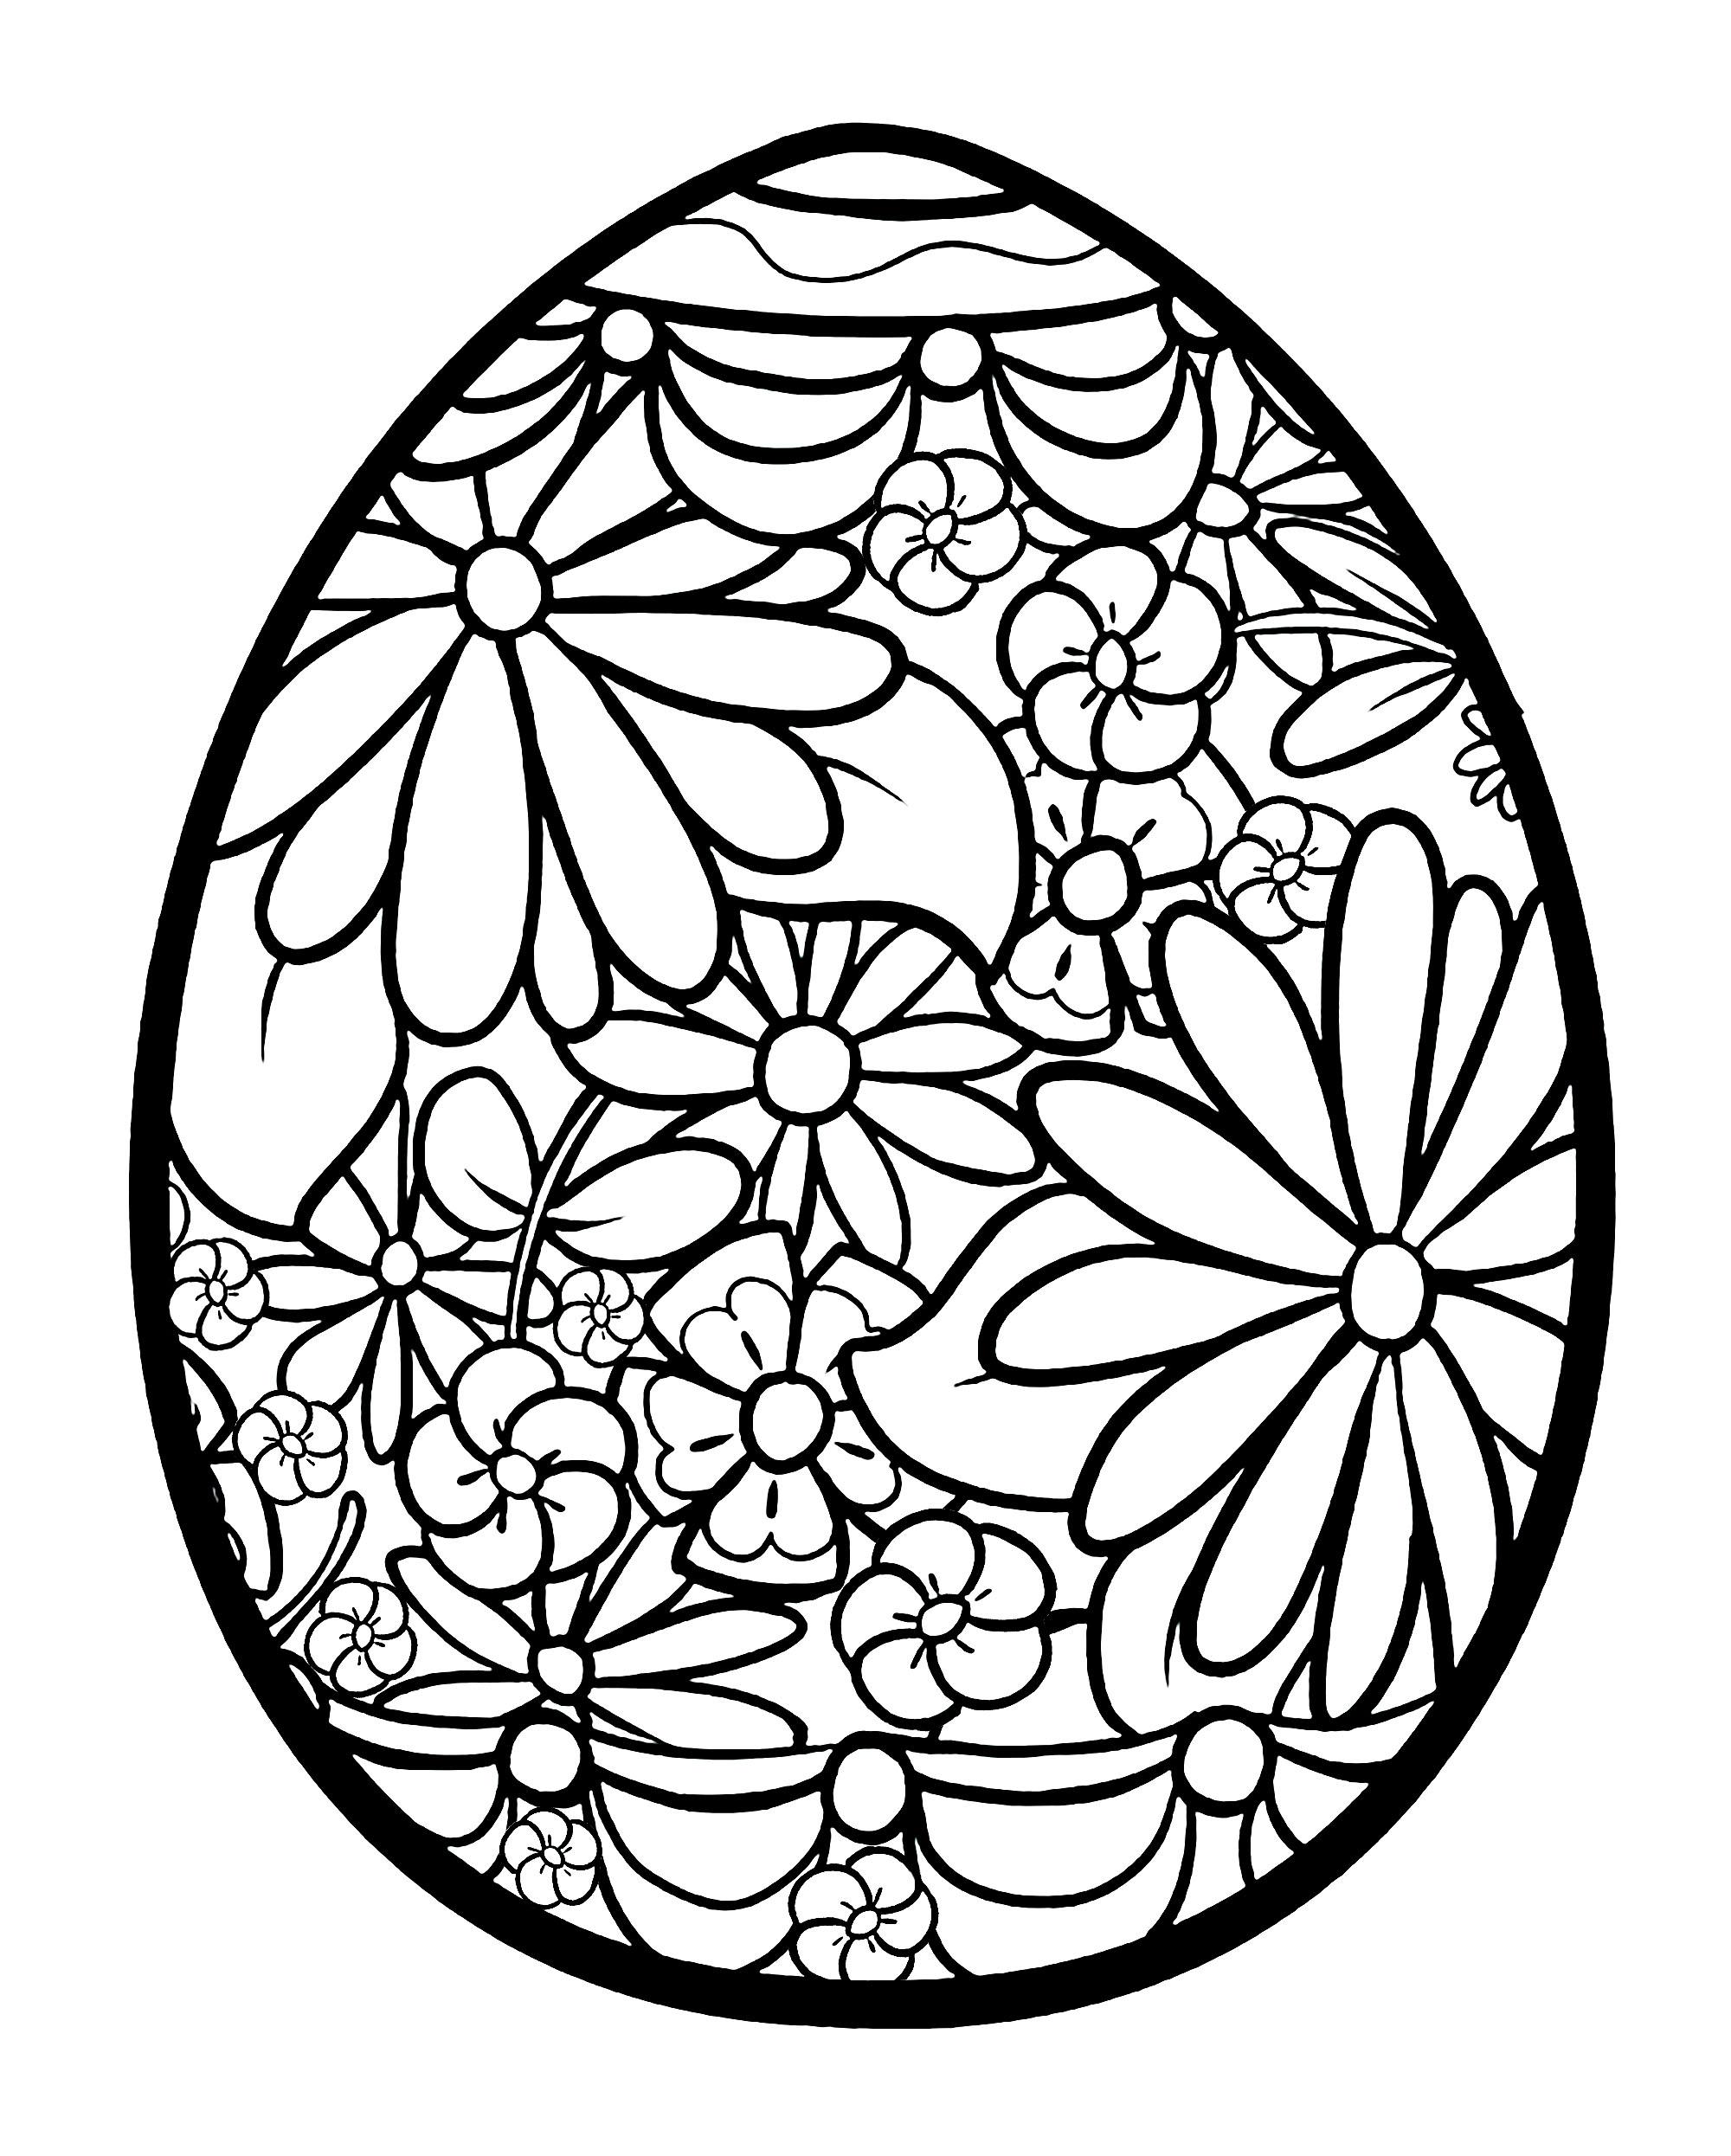 Pascua de resurreccion 4986 - Pascua de Resurrección - Colorear para ...